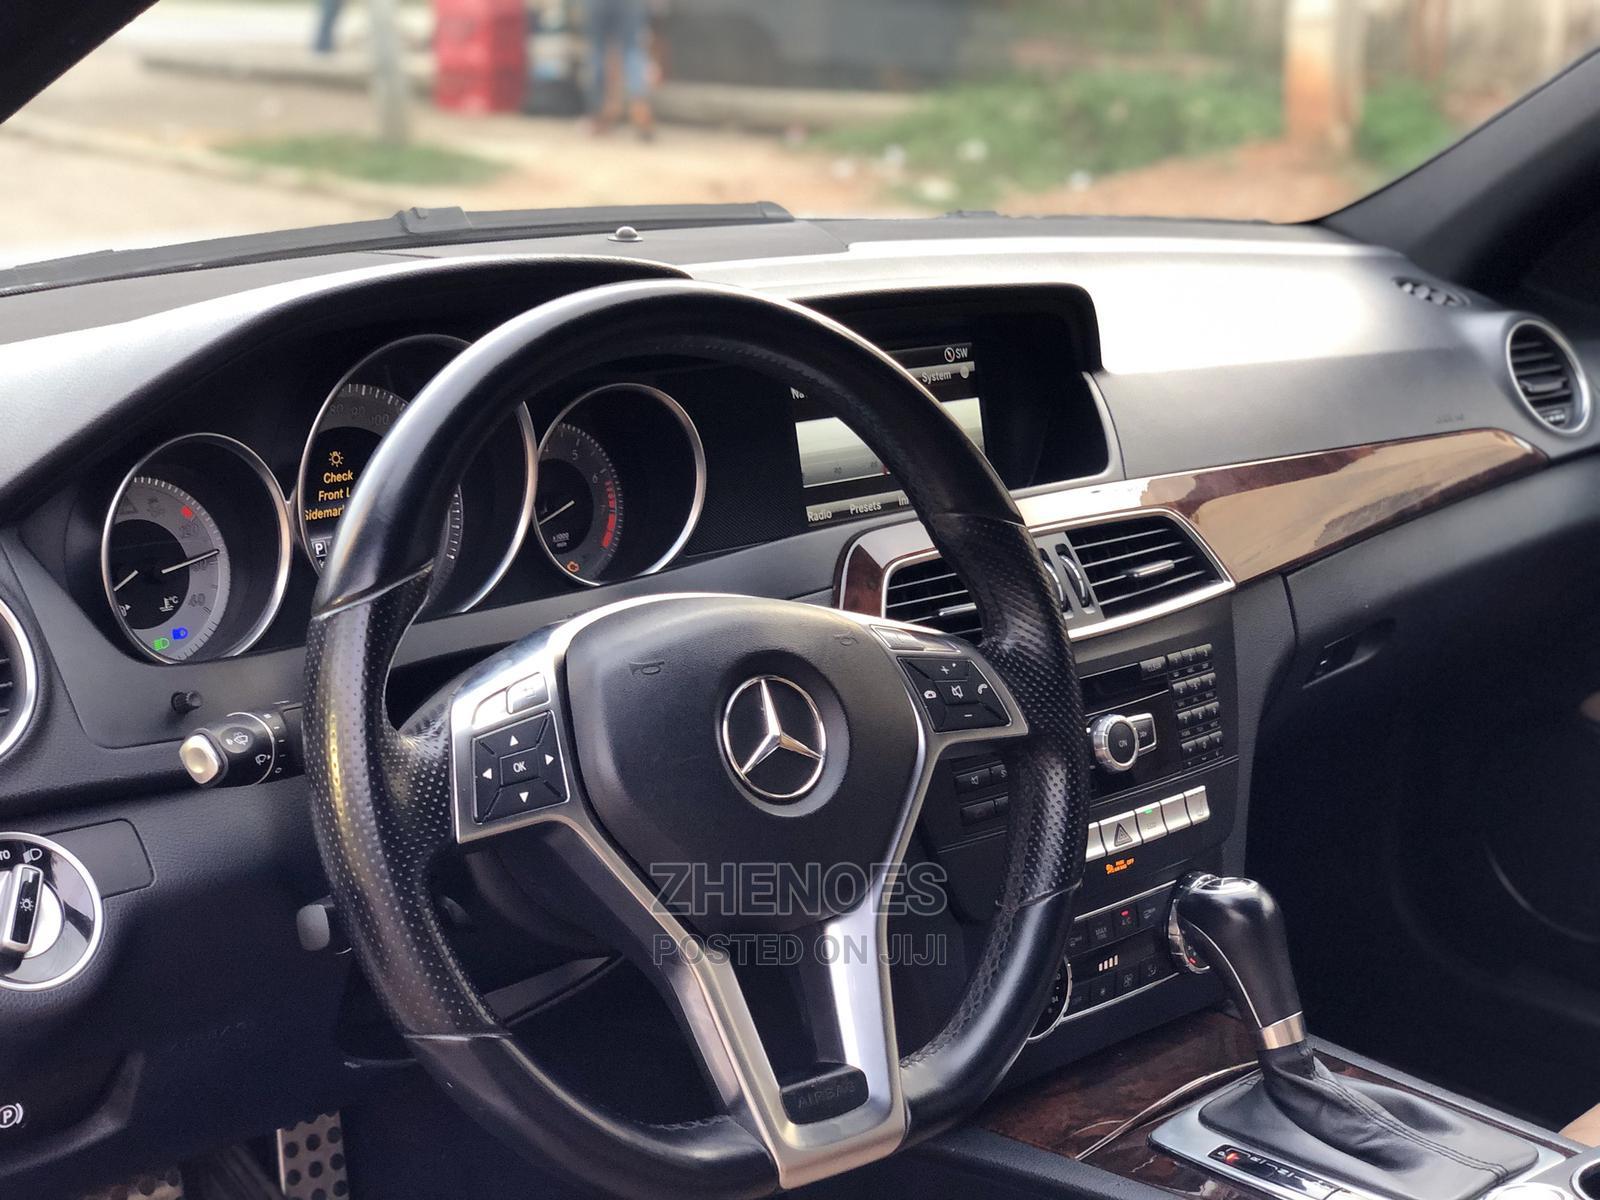 Archive: Mercedes-Benz C300 2013 White